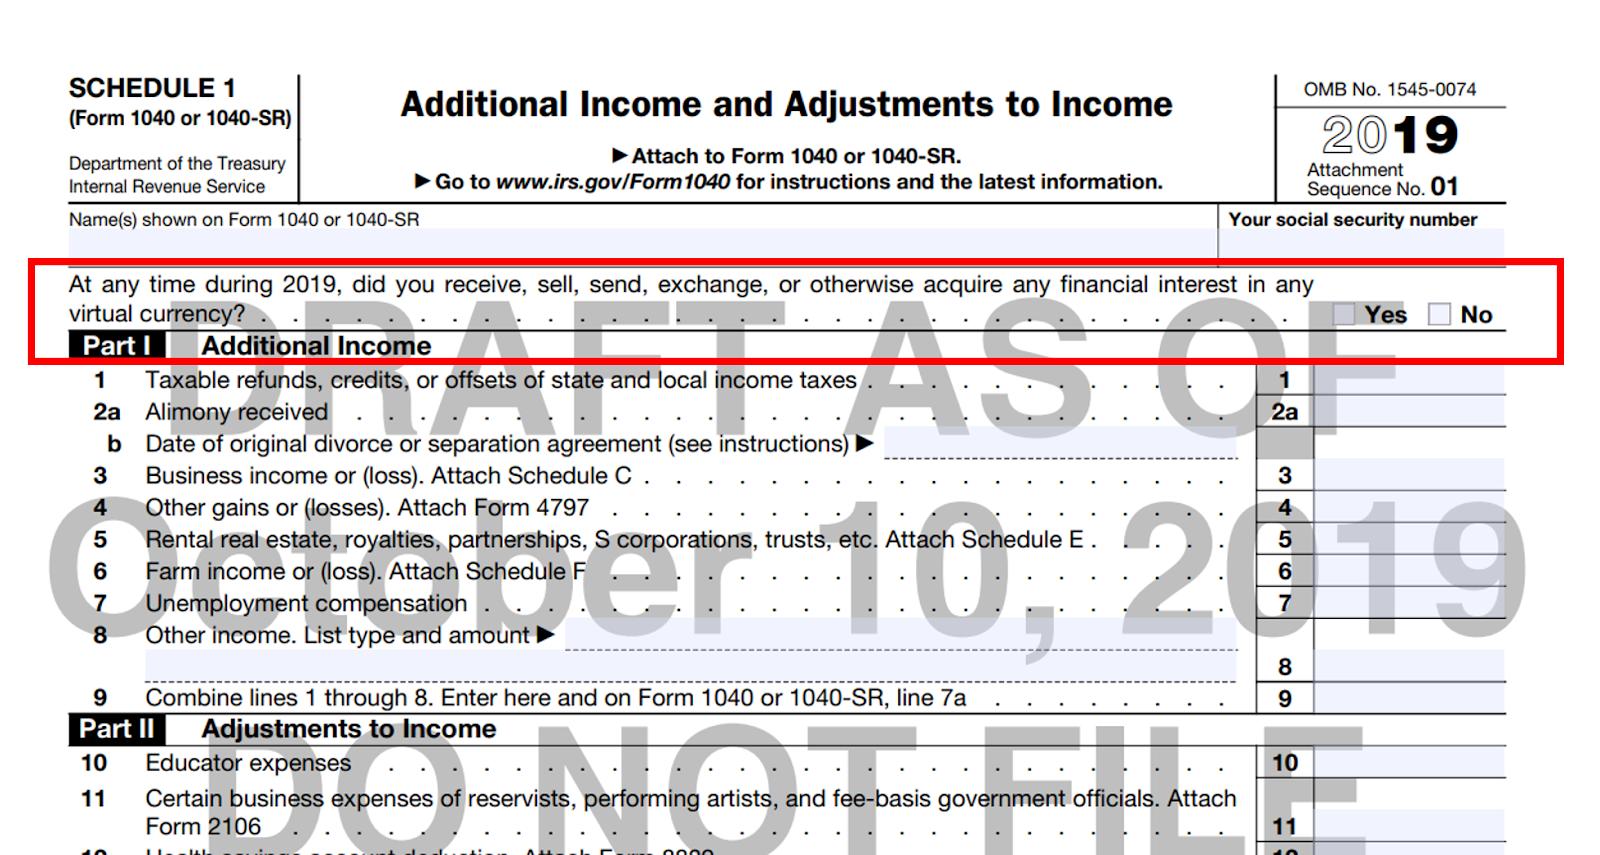 IRS Schedule 1, 2019 (draft)